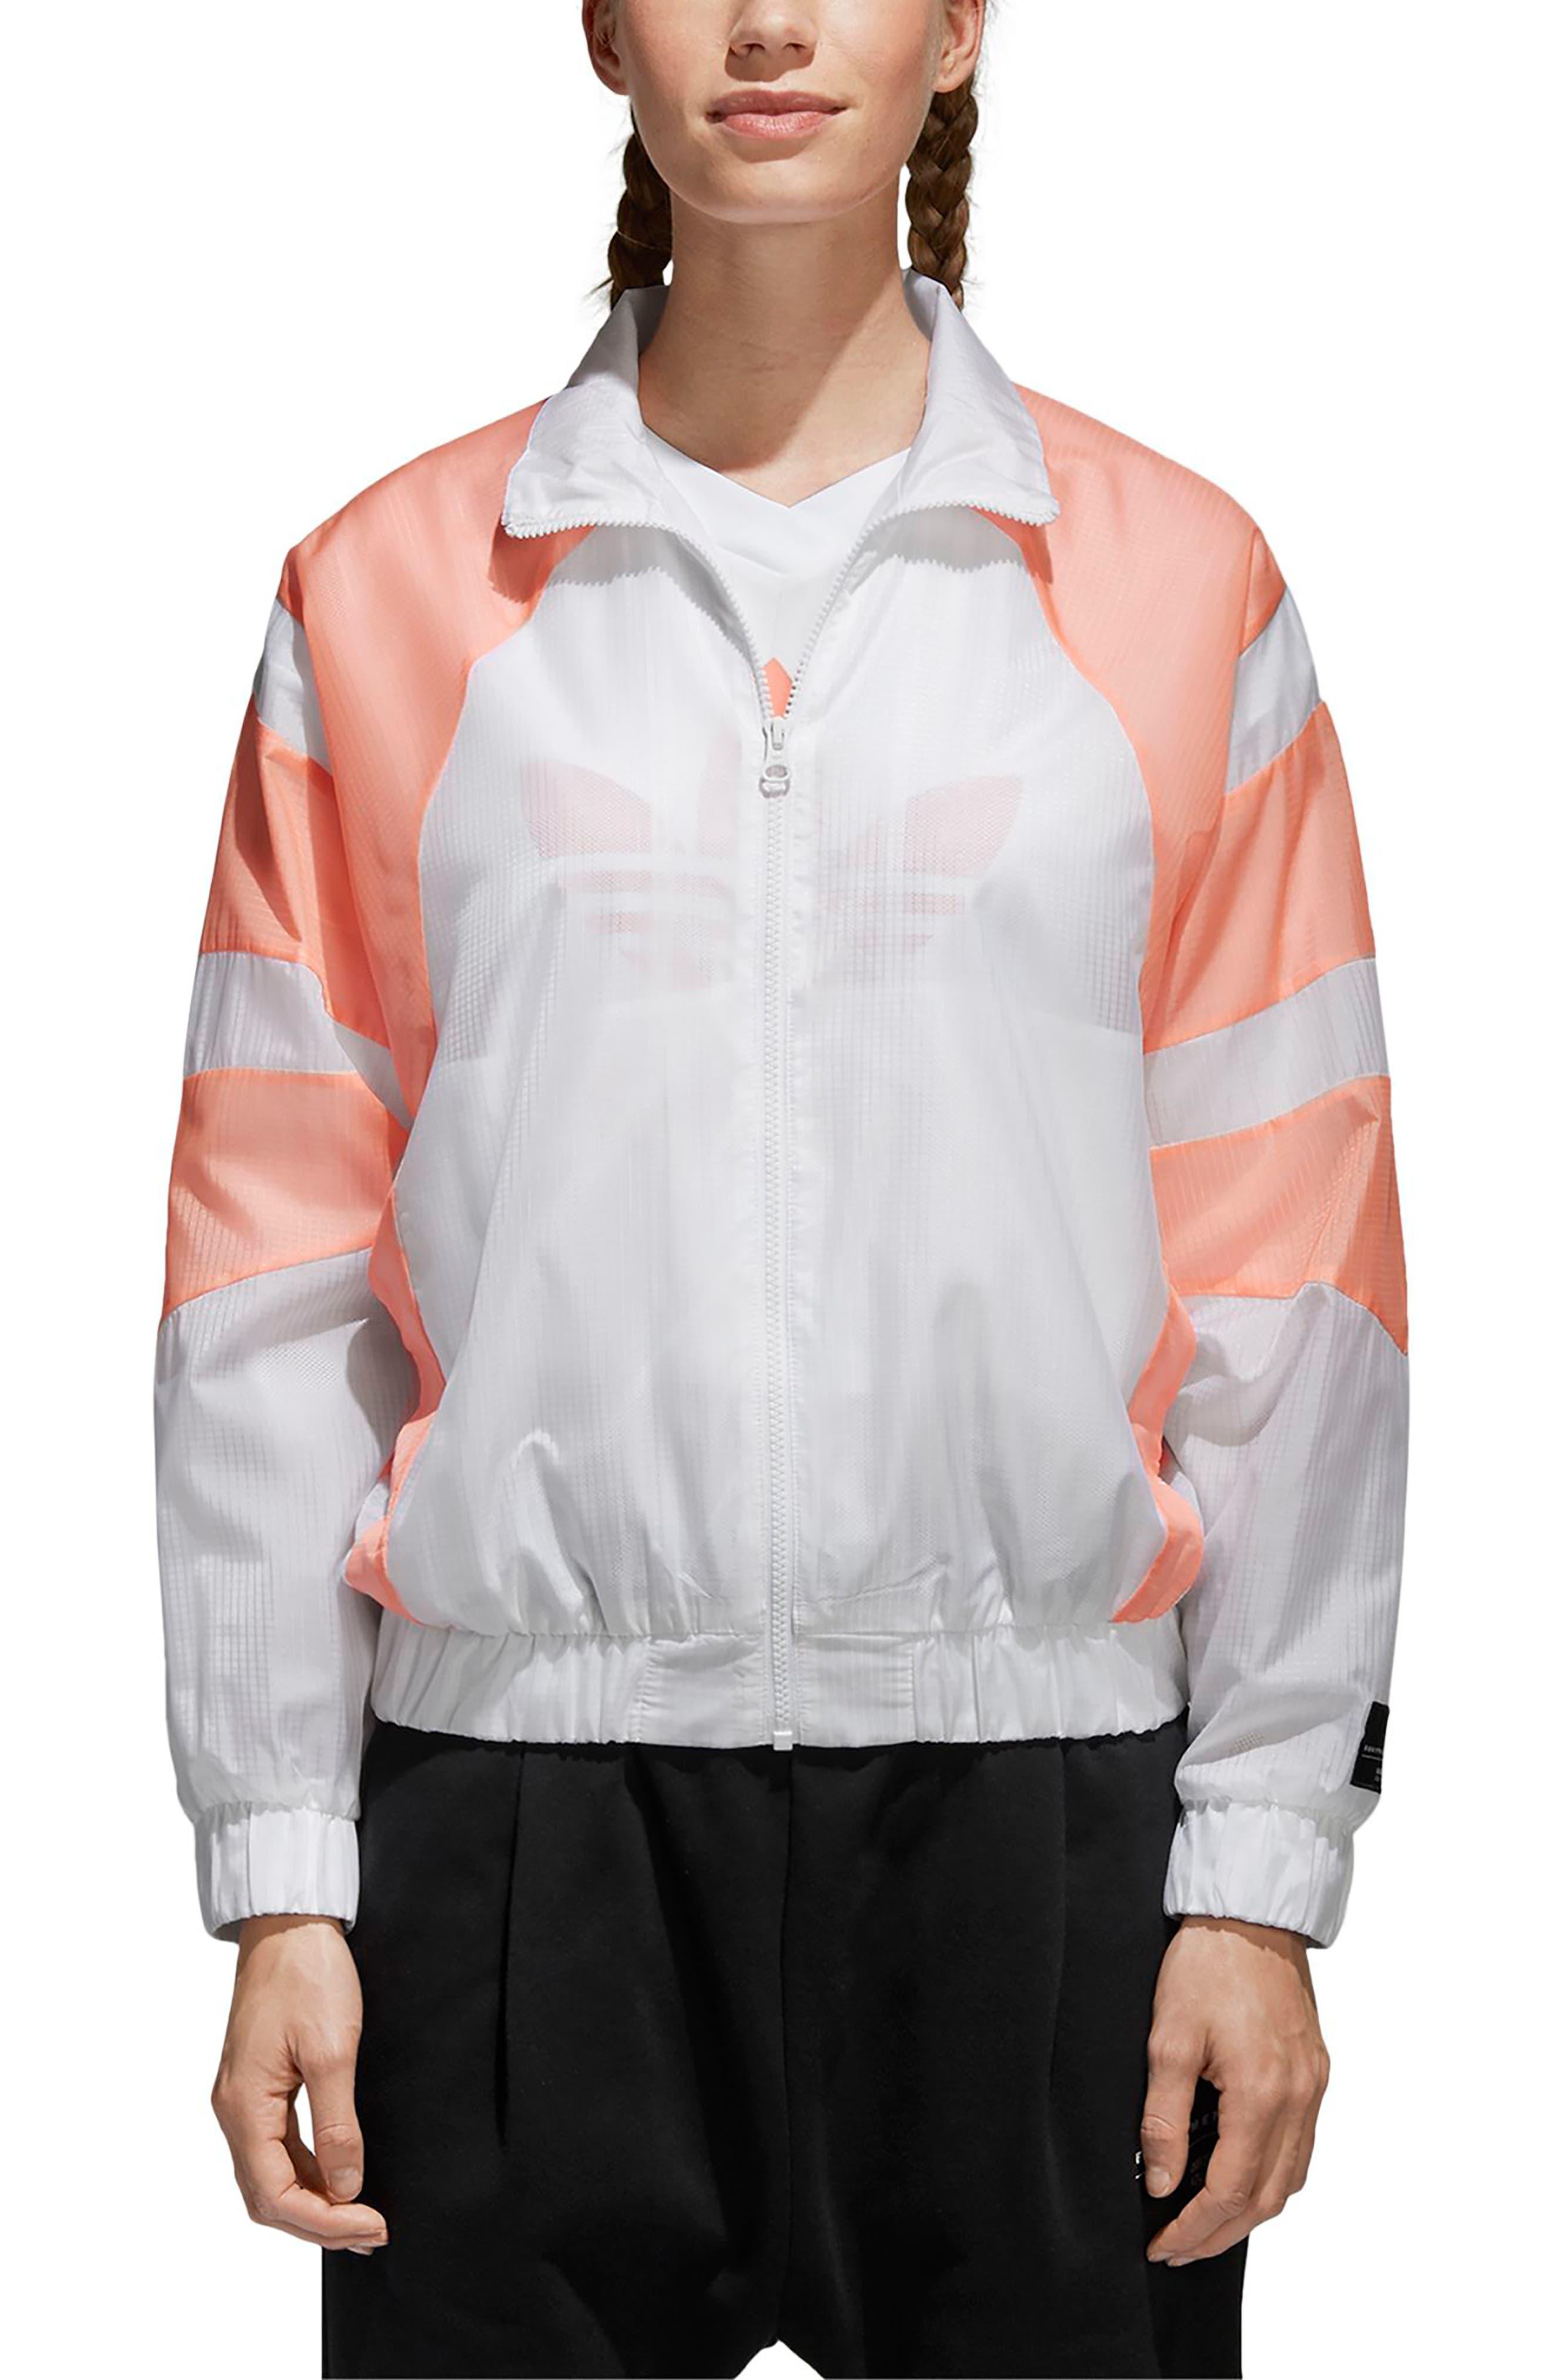 adidas EQT Track Jacket